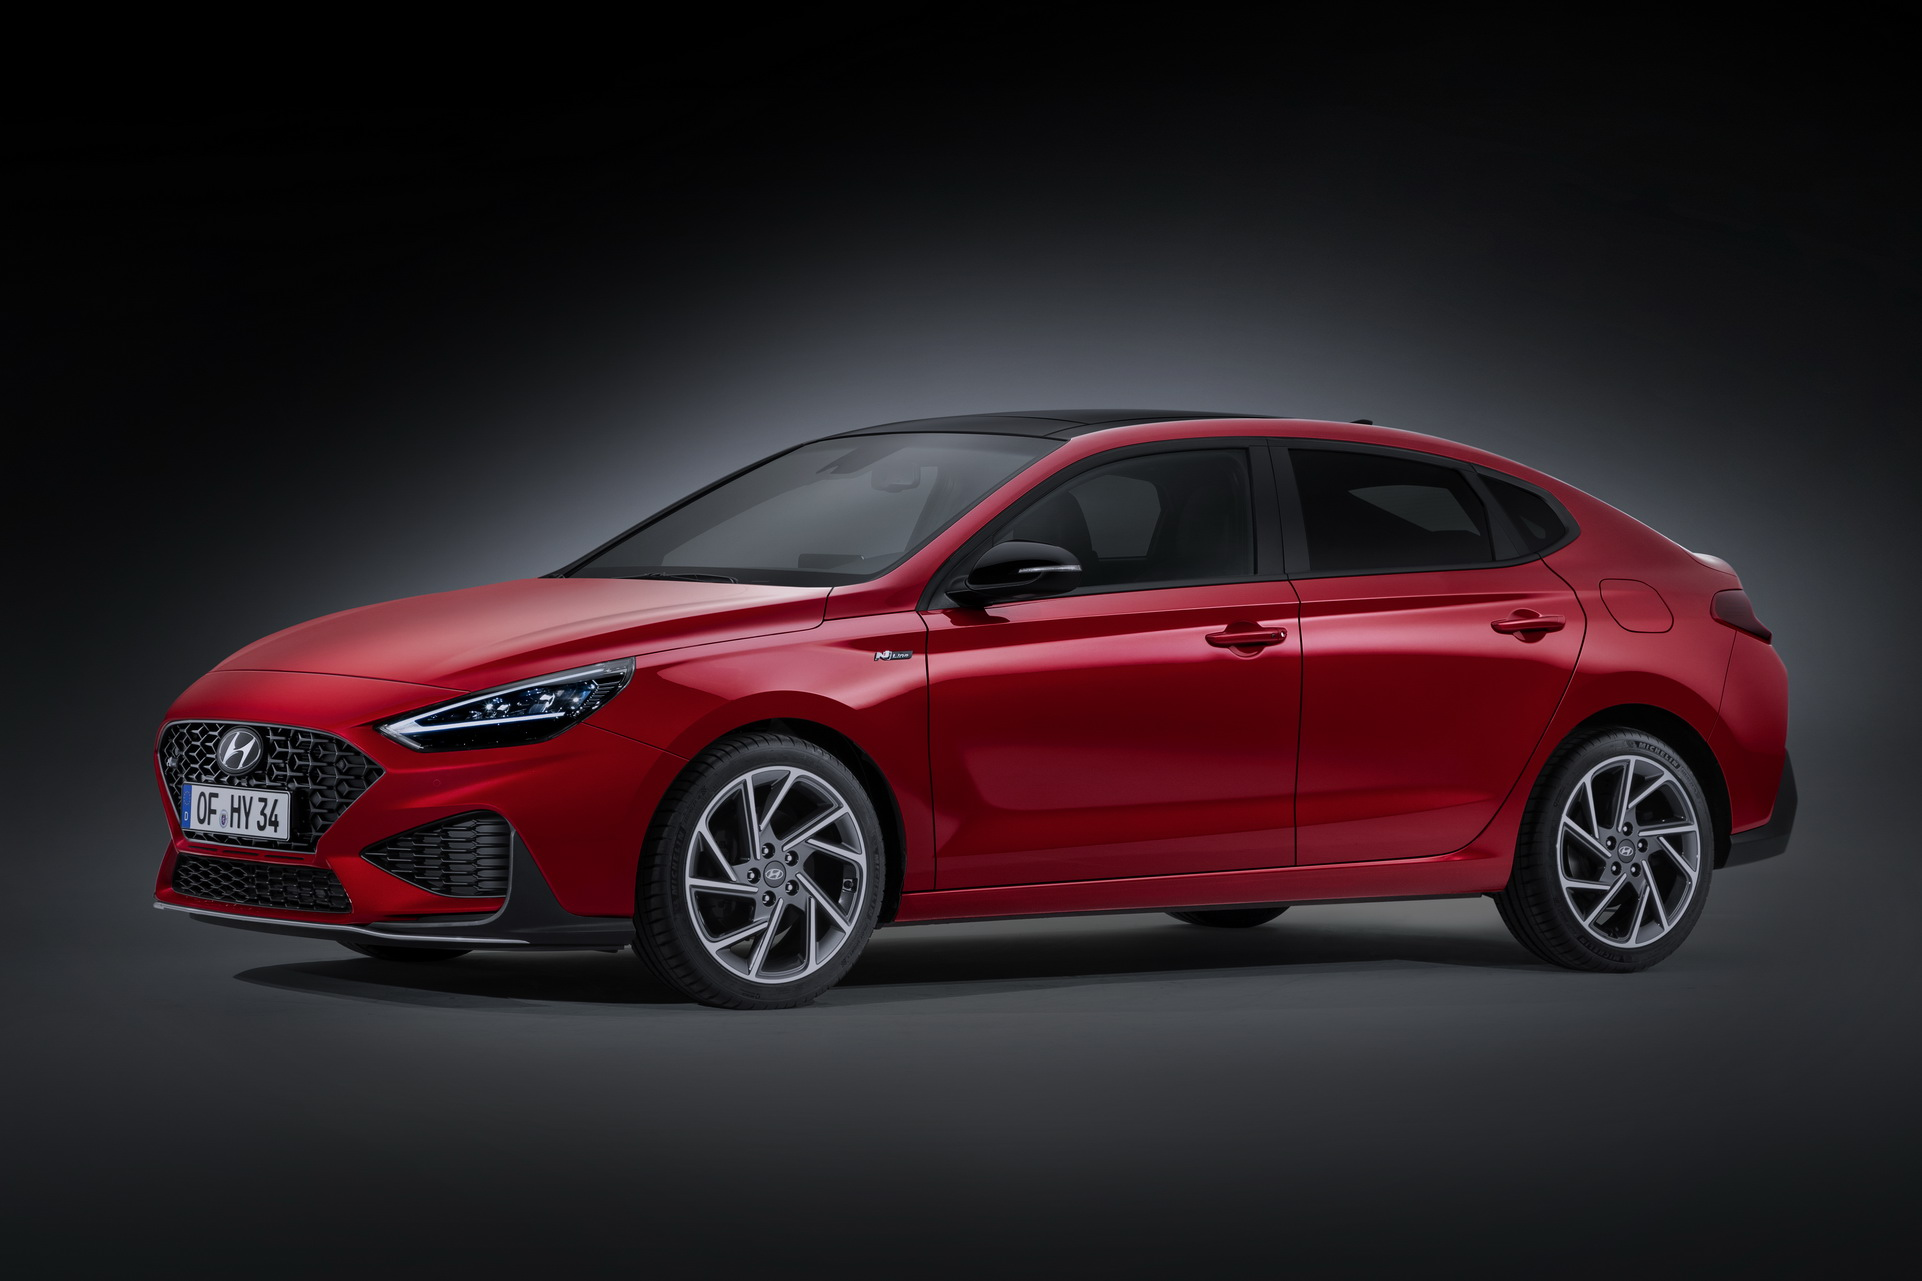 Hyundai-i30-facelift-2020-9